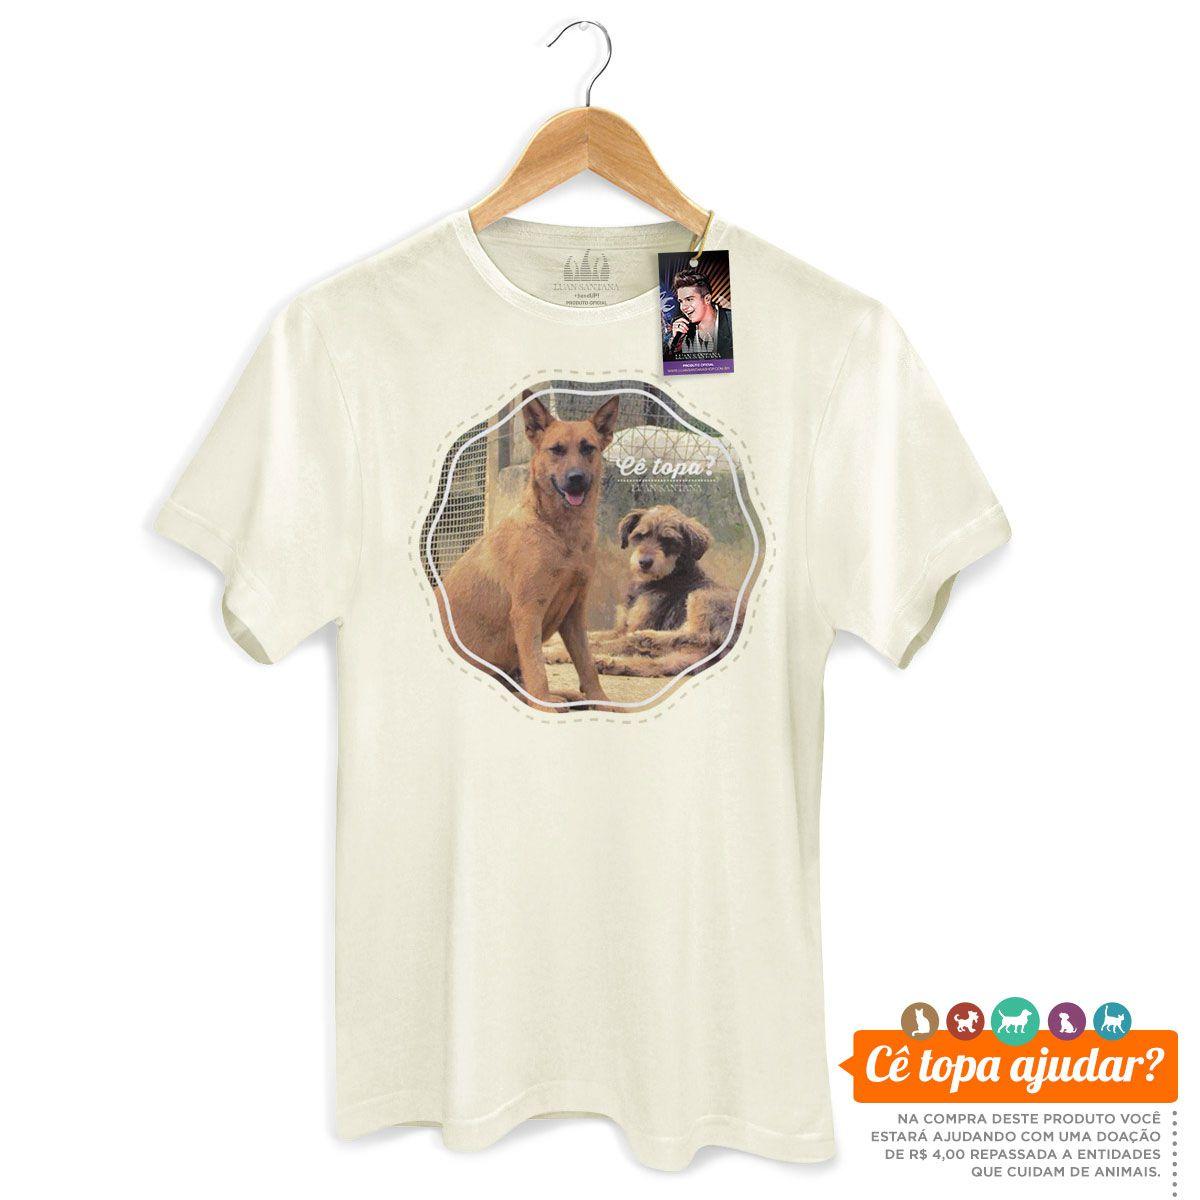 Camiseta Masculina Luan Santana Cê Topa Me Adotar?